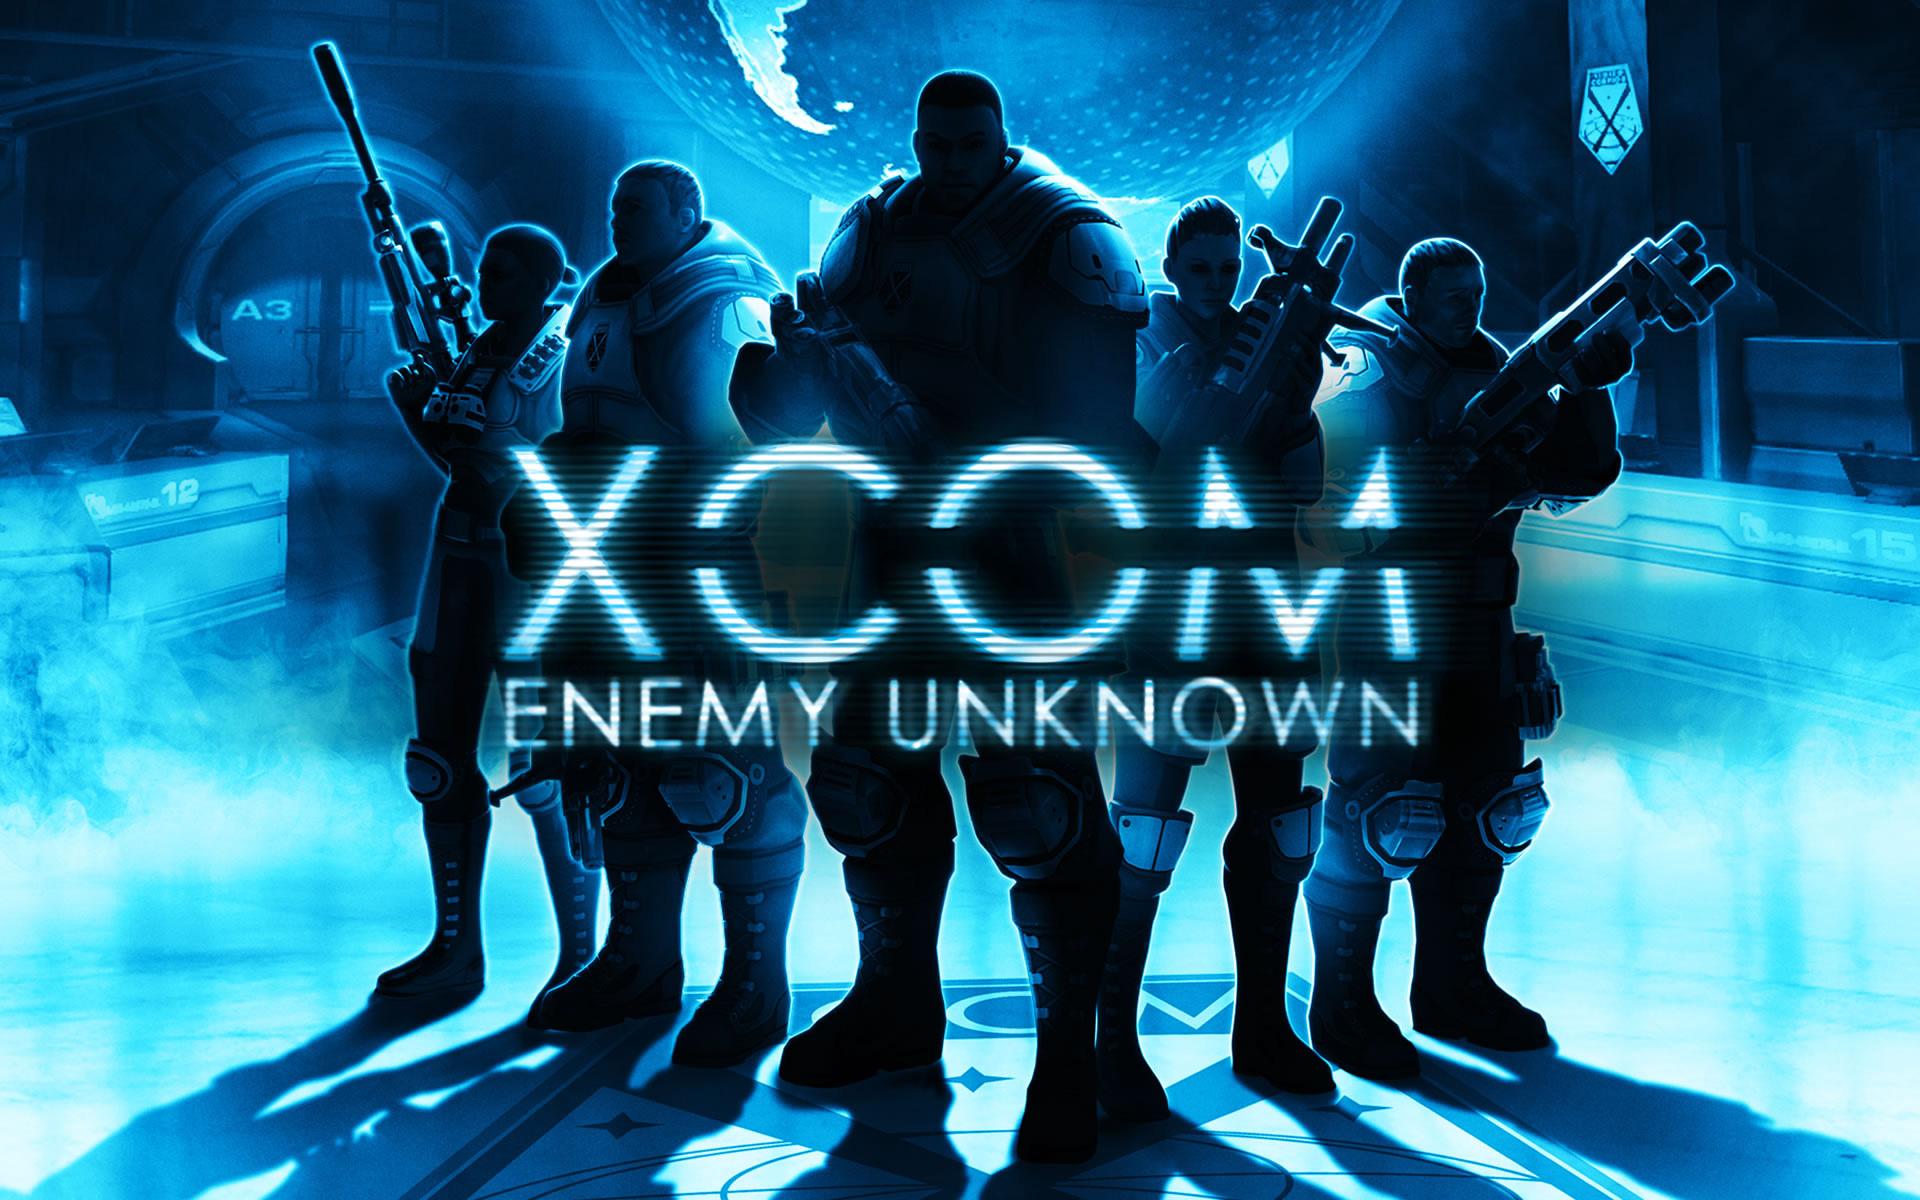 Free XCOM: Enemy Unknown Wallpaper in 1920x1200